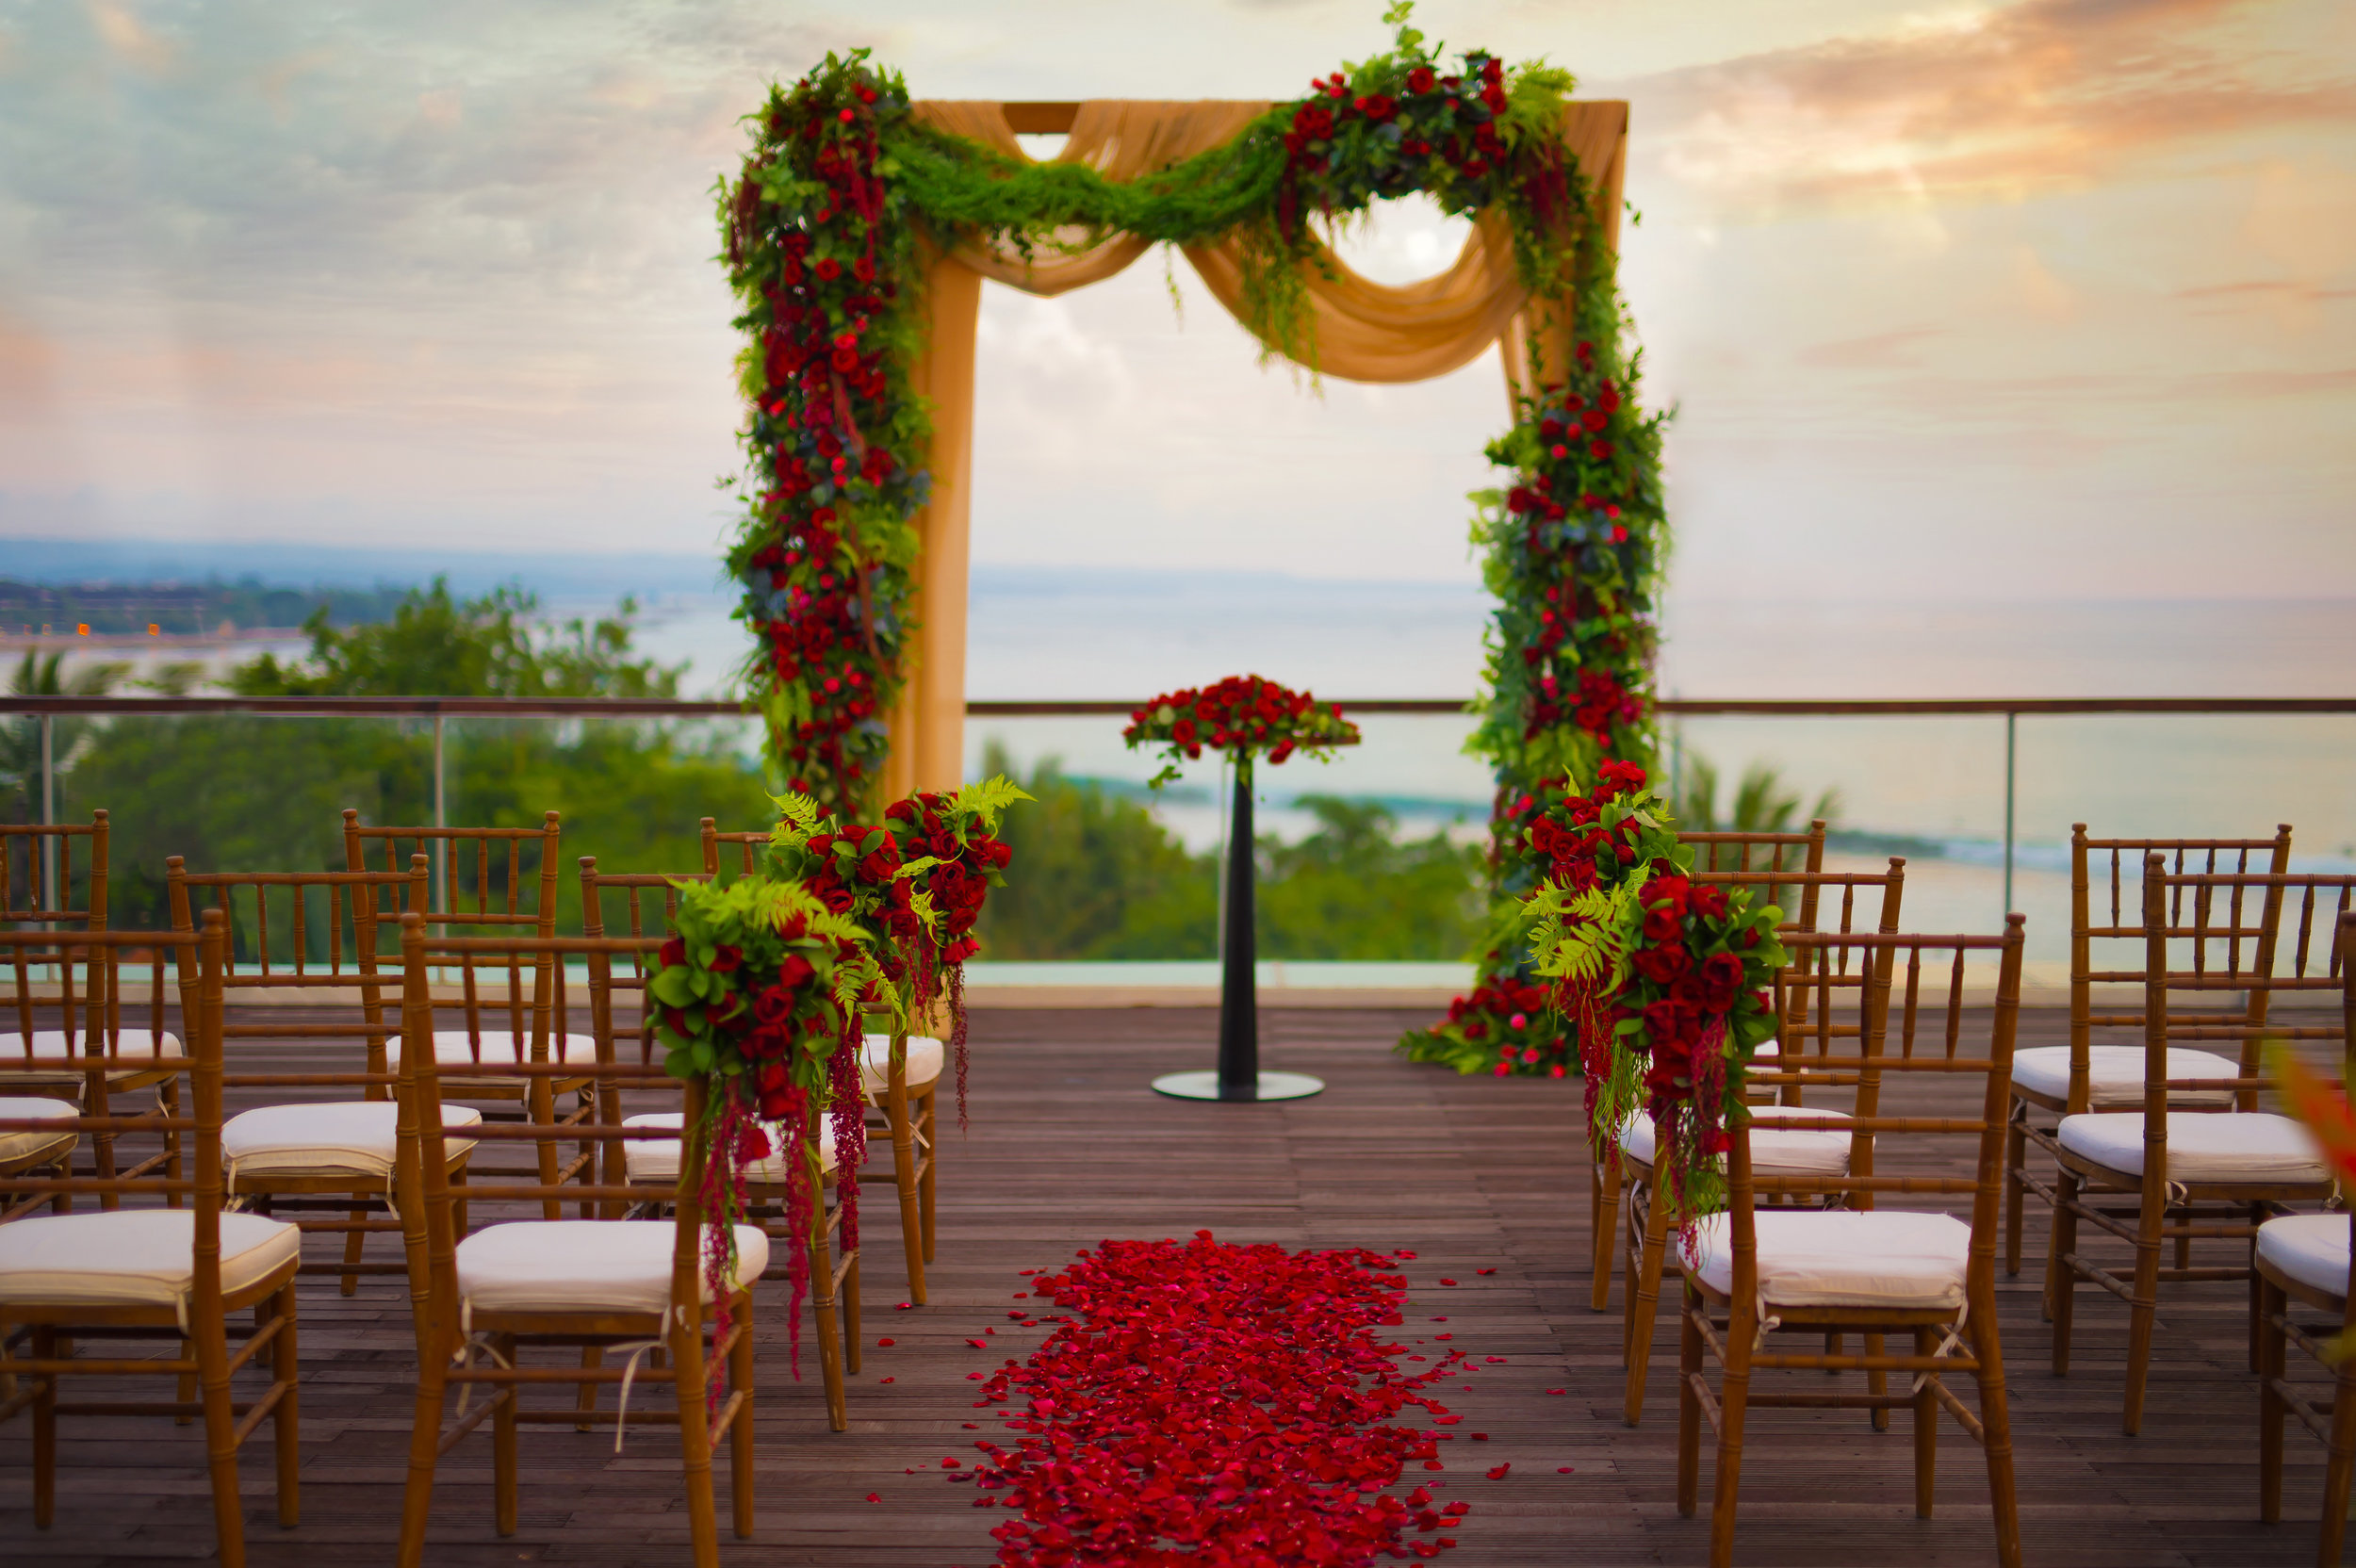 Sheraton Bali - Bene Rooftop - Wedding Setup with Red Rose Petals aisle.jpg